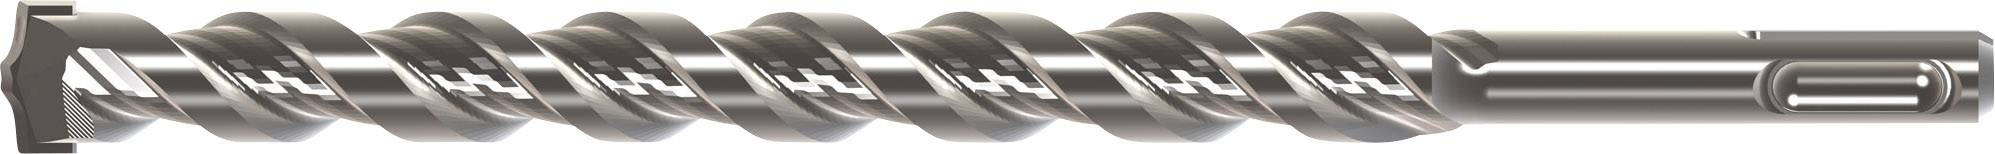 Tvrdý kov kladivový vrták Heller 163163, 14 mm, 300 mm, 1 ks